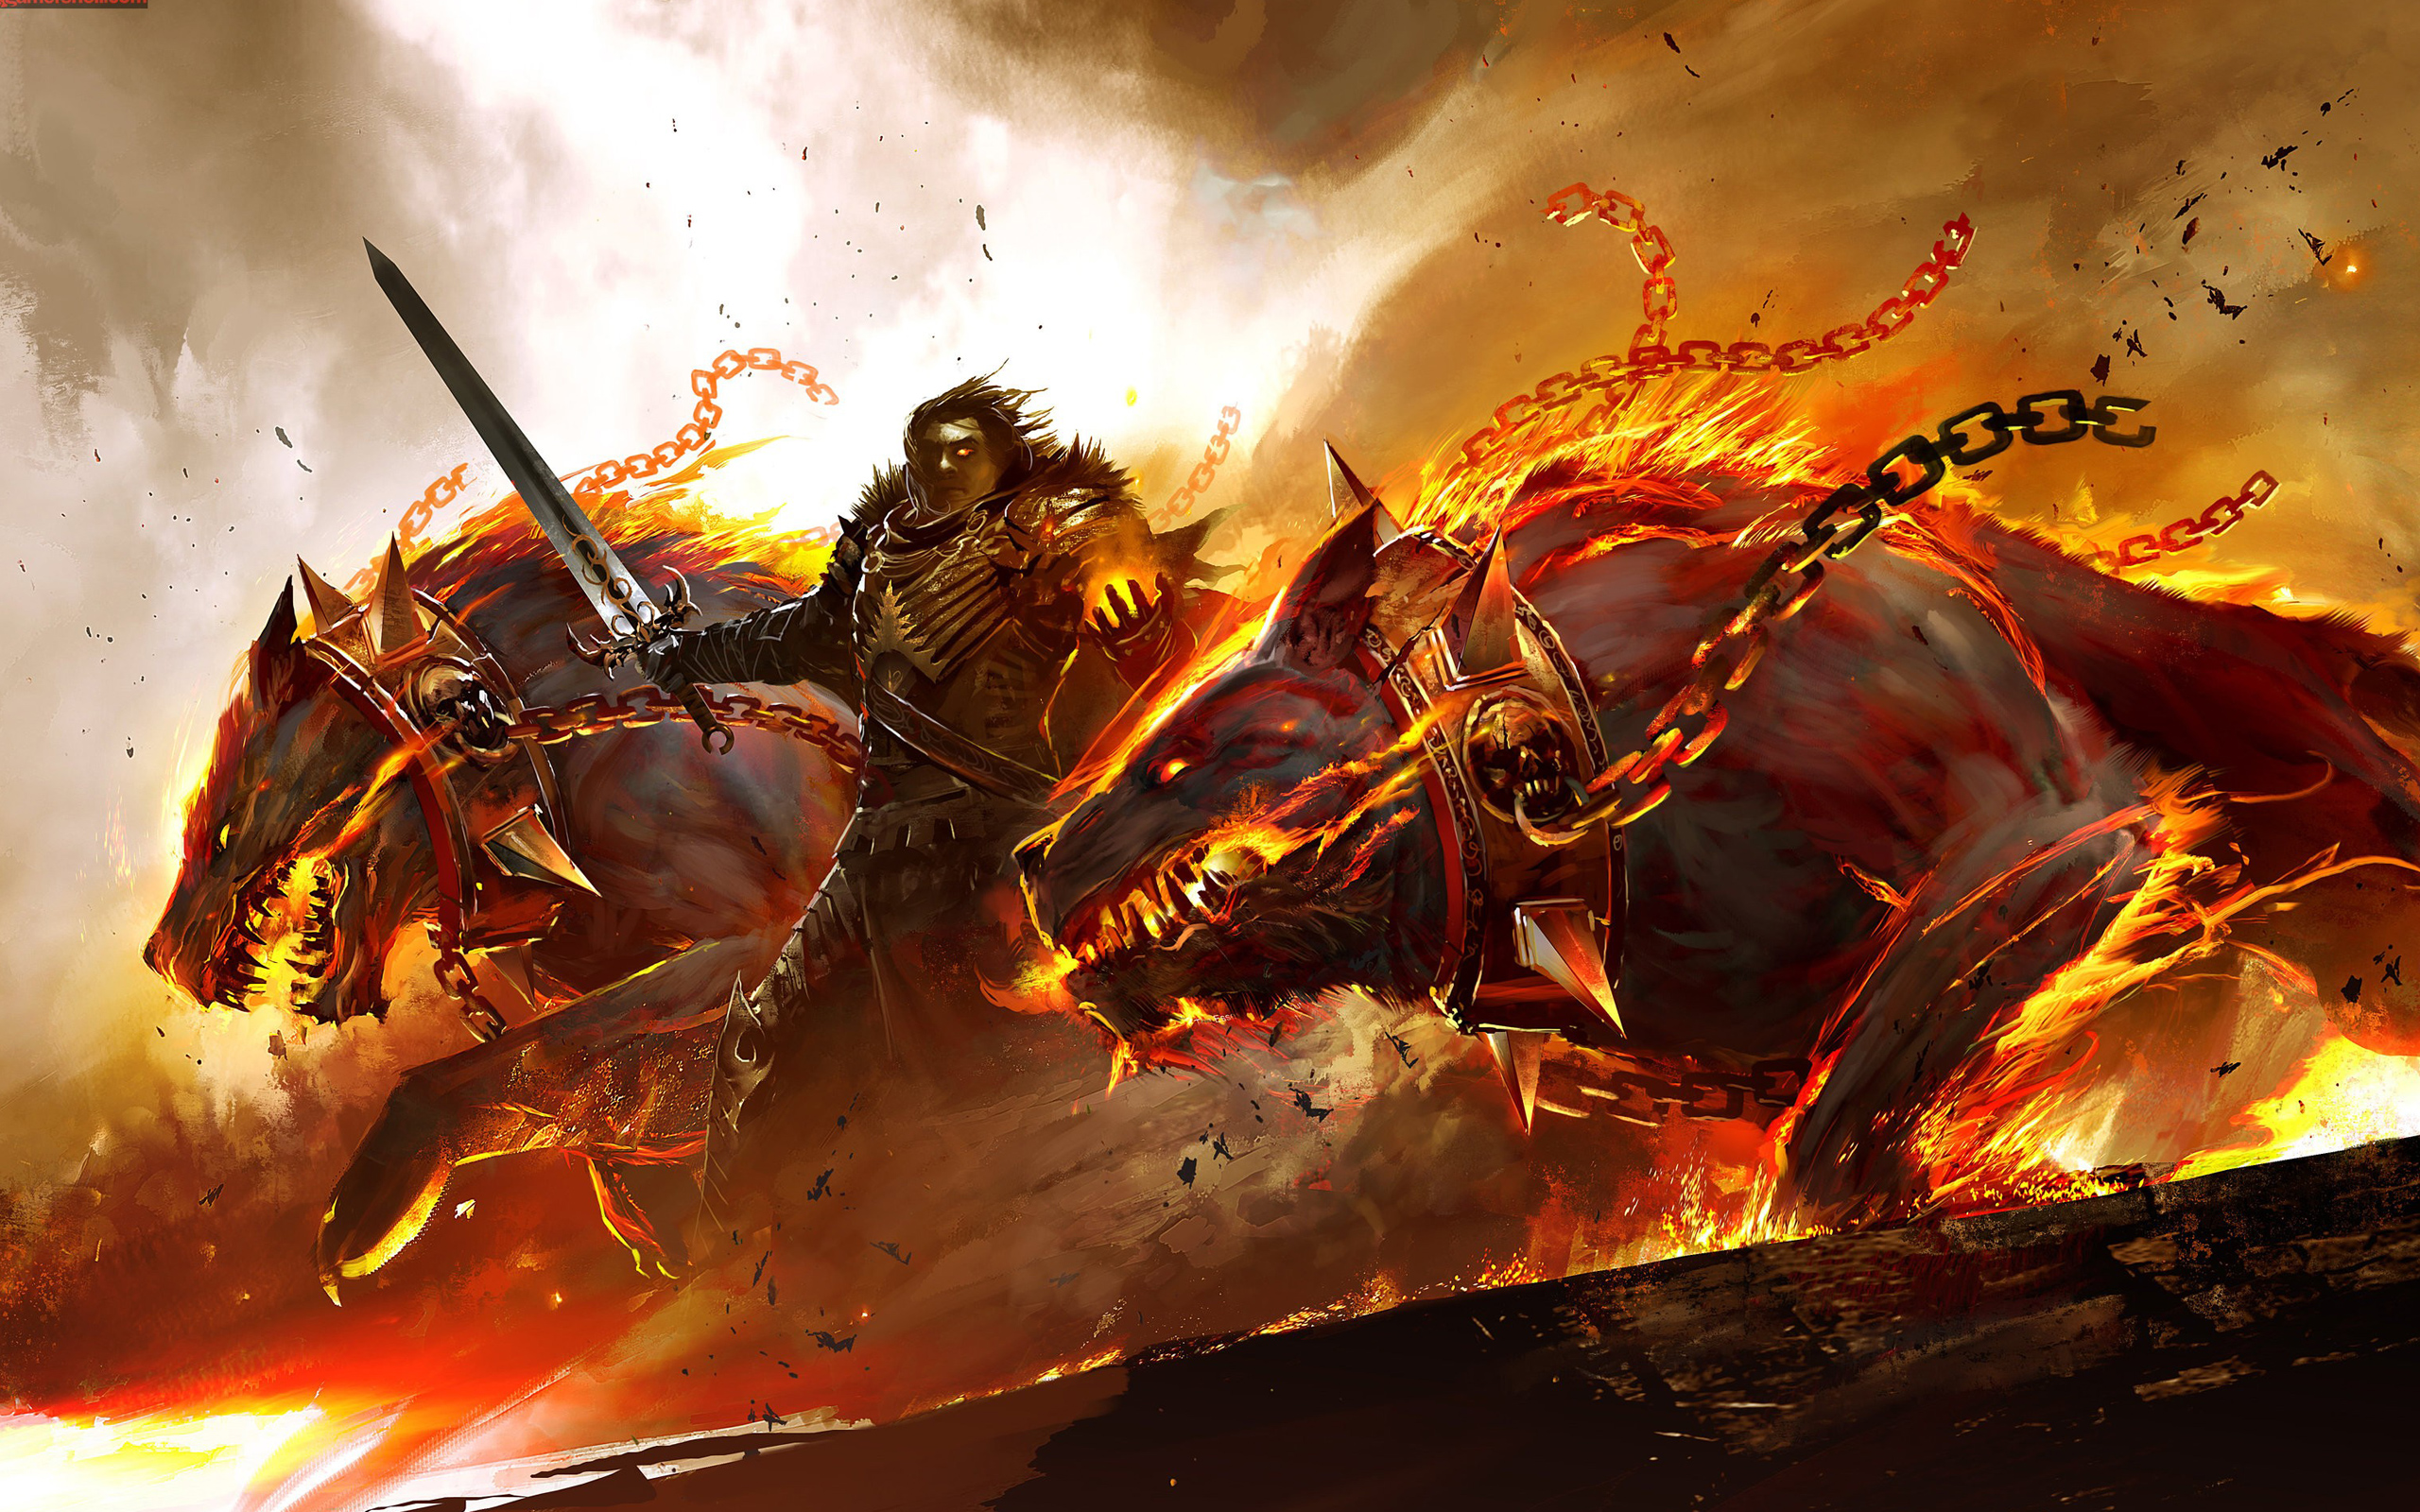 Guild Wars 2 Wallpapers HD Wallpapers 2560x1600